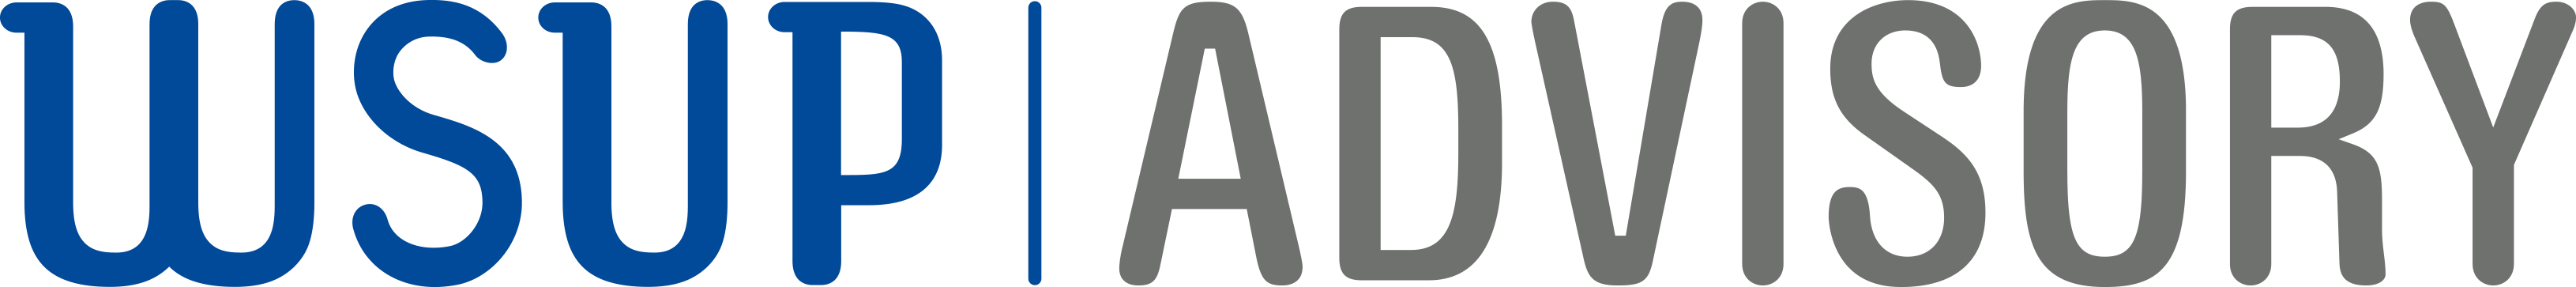 WSUP Advisory logo